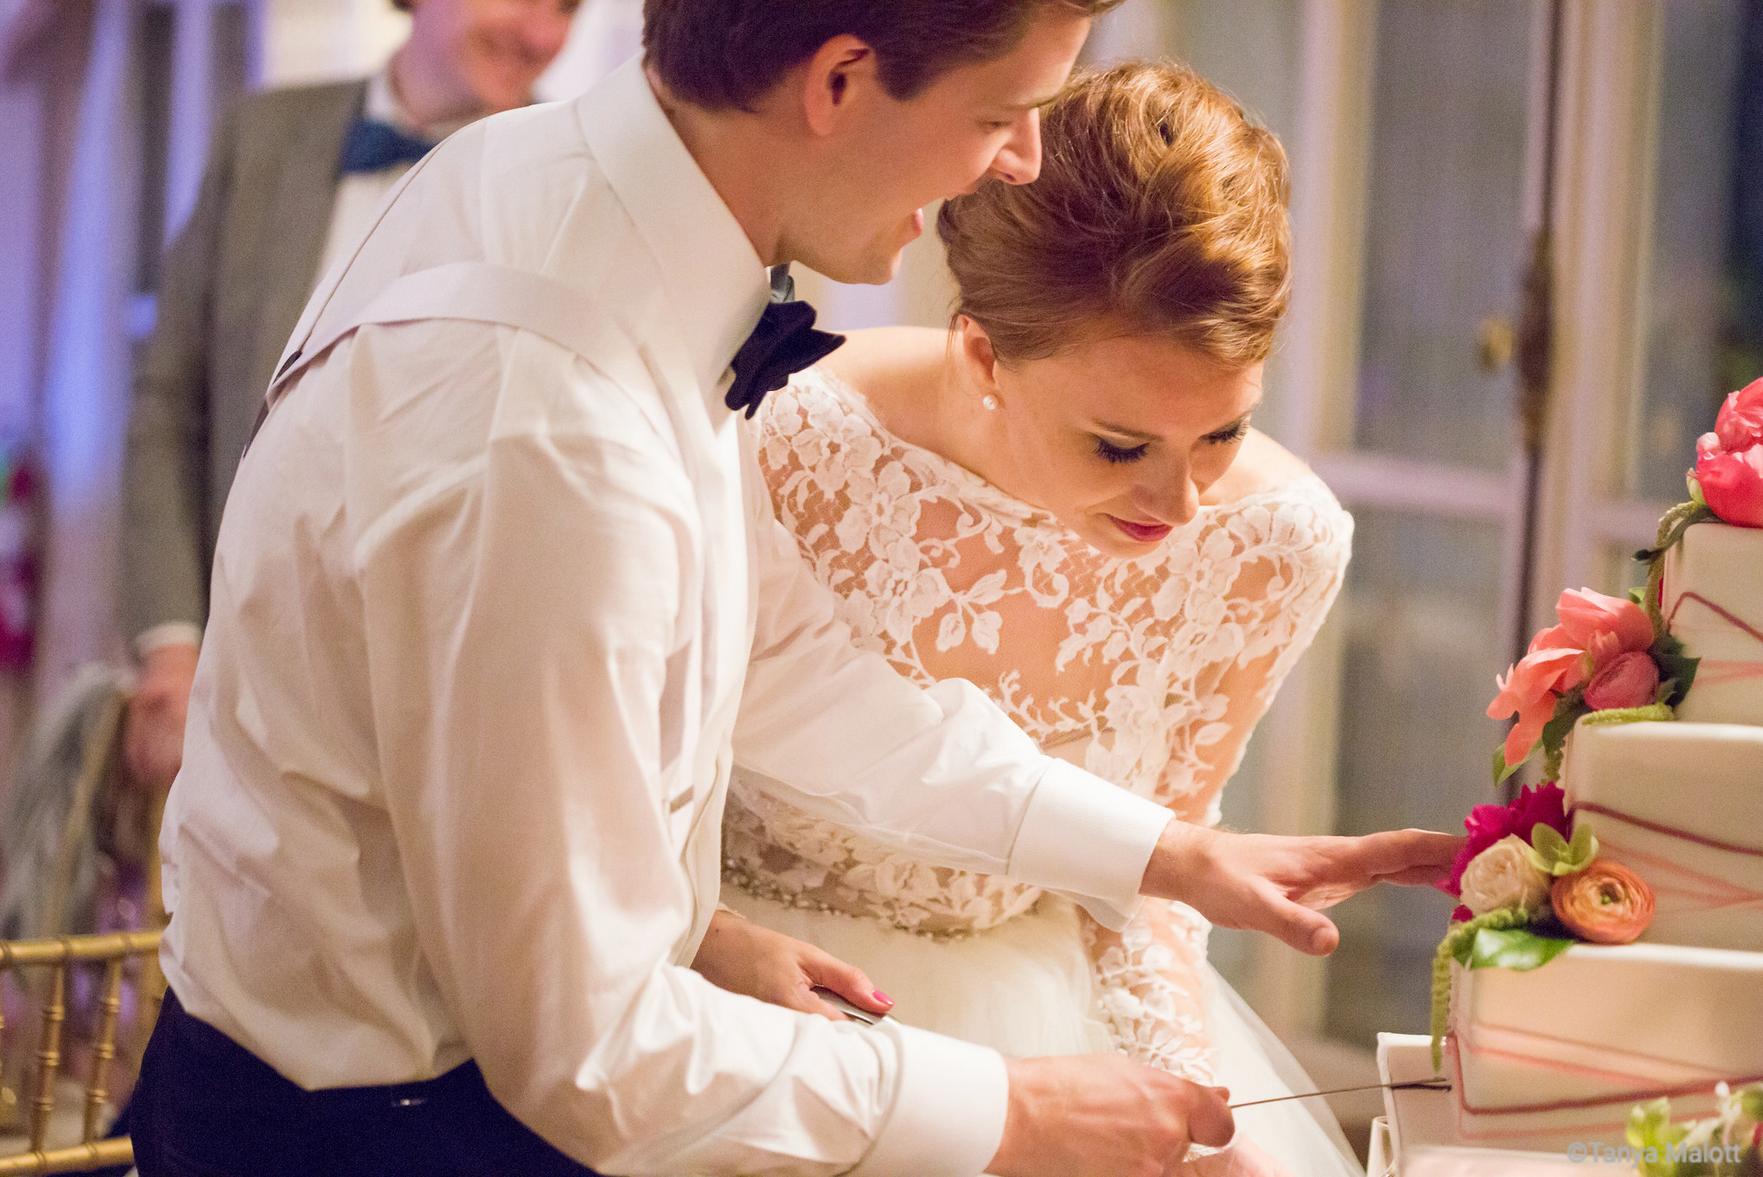 New-York-Portrait-Wedding-Family-Photographer-Tanya-Malott_0180_.PNG